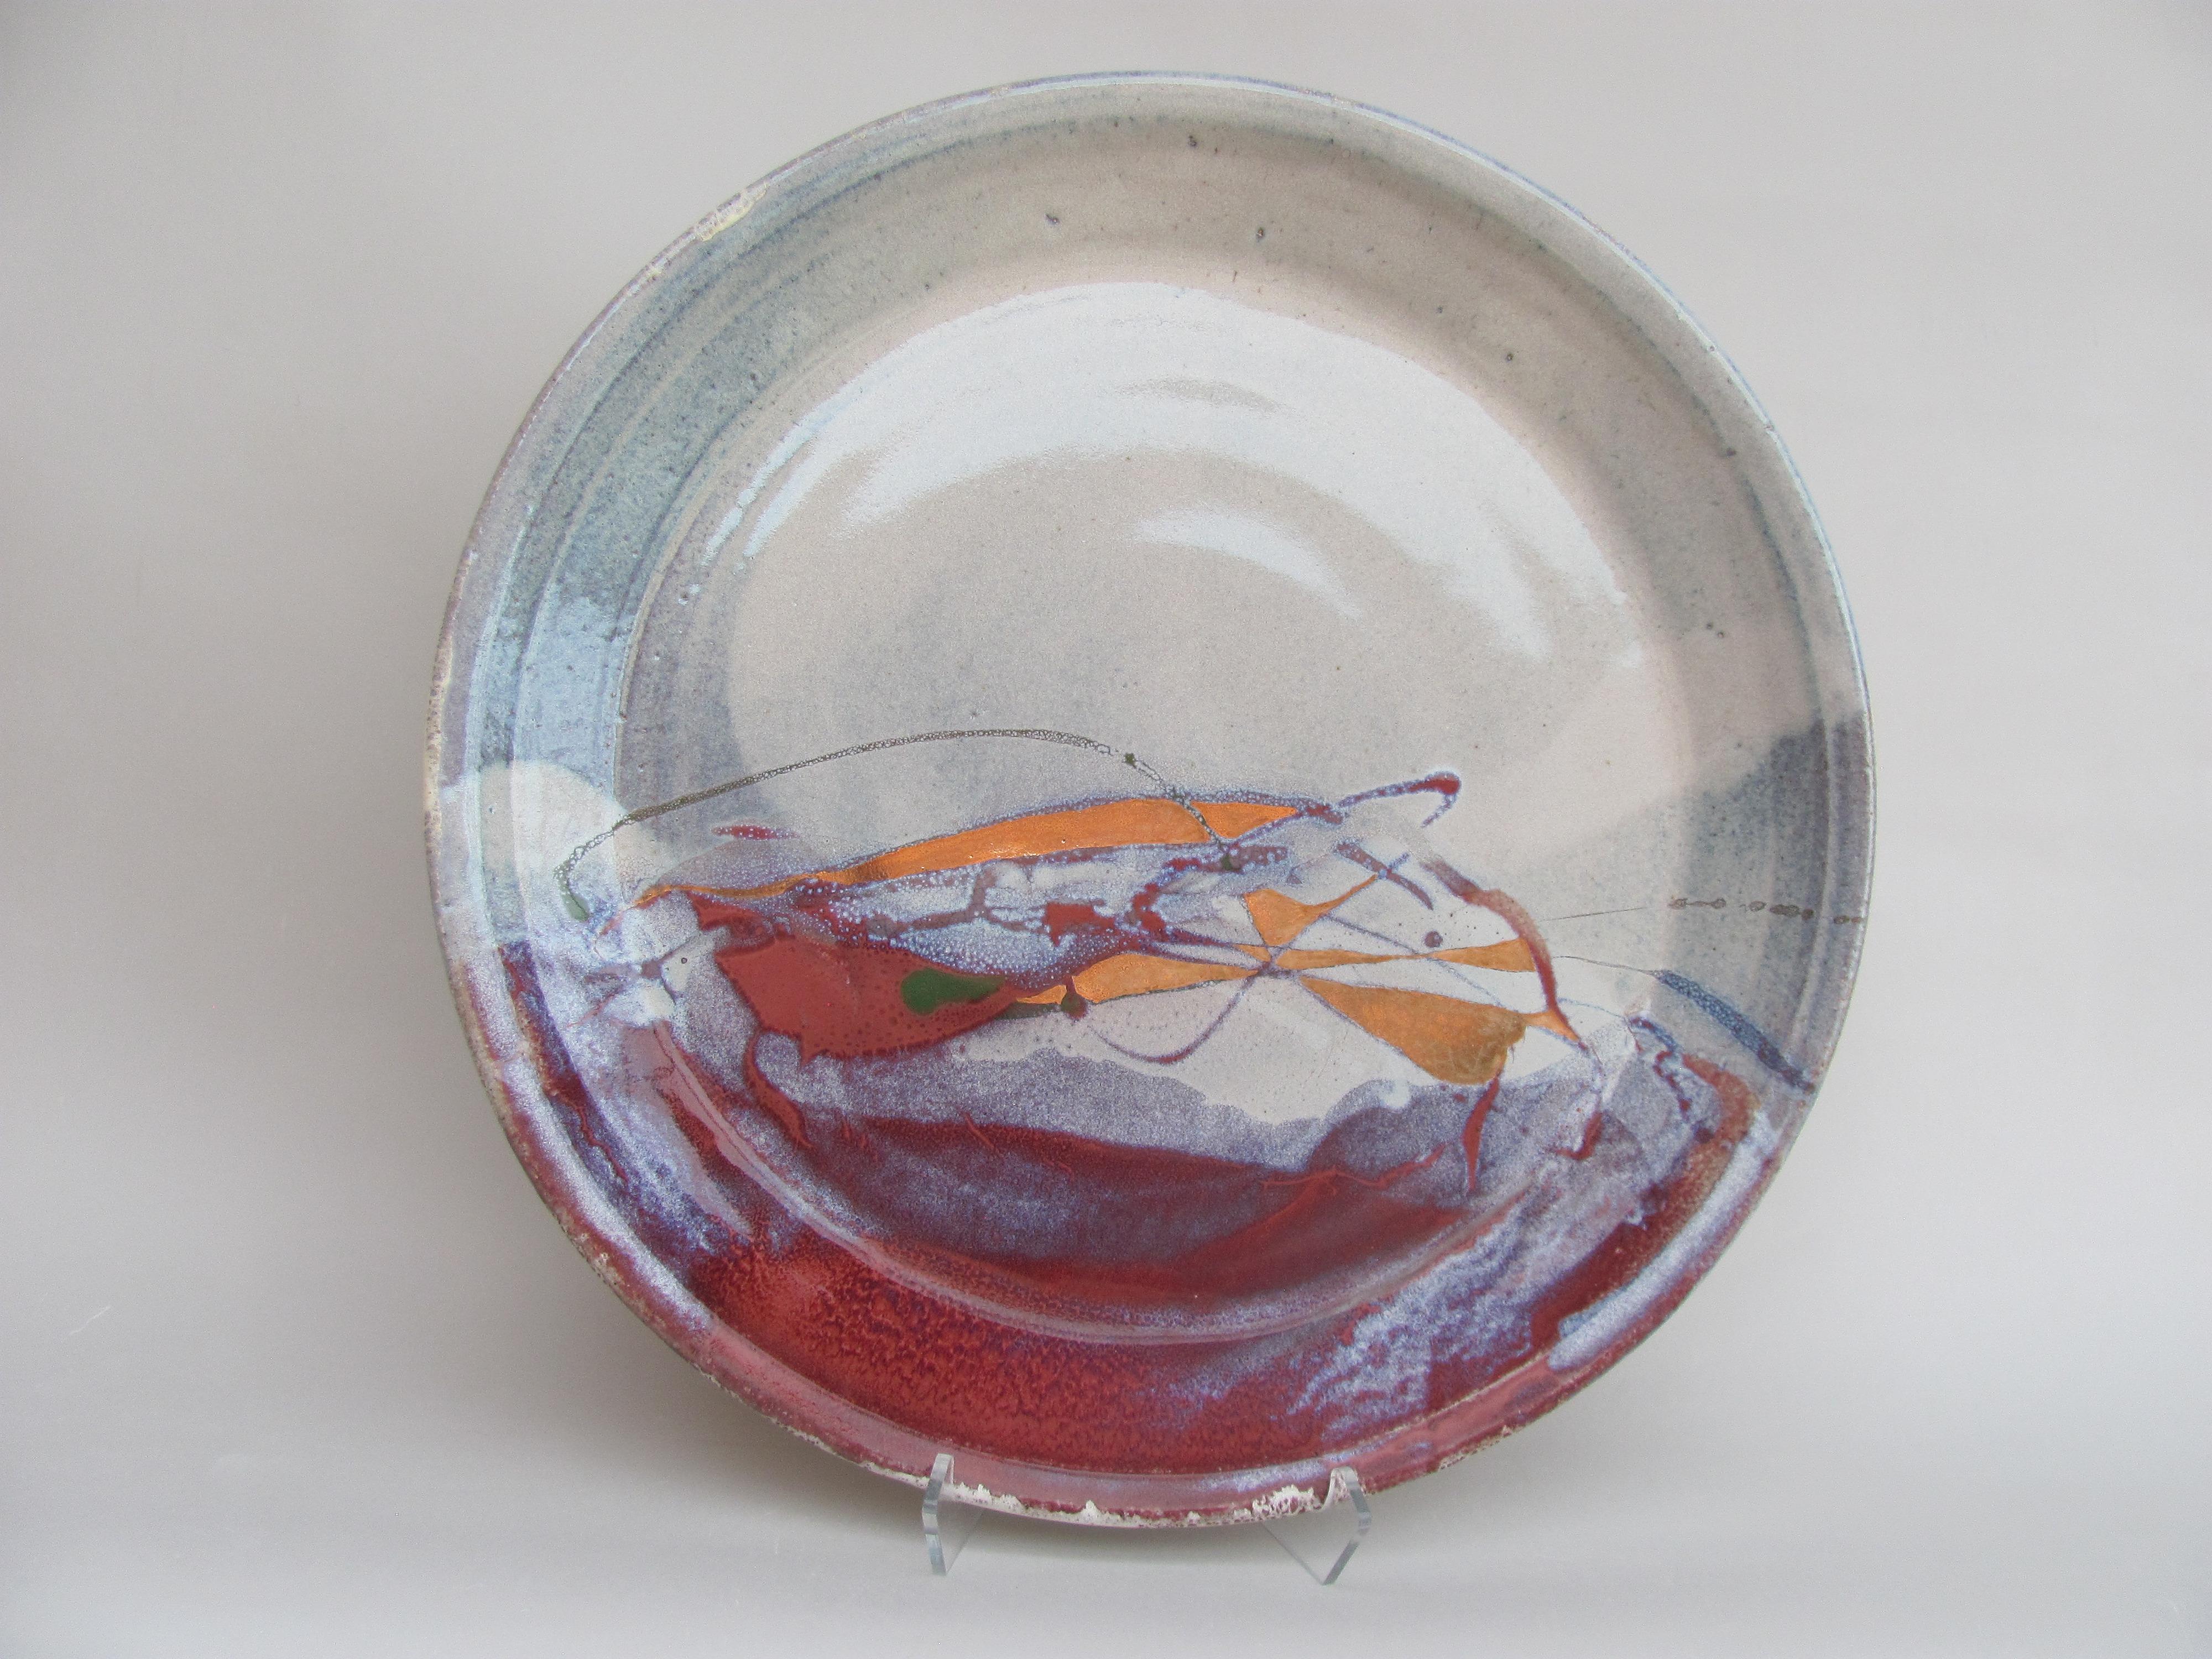 luster platter 4 by Macy Dorf | ArtworkNetwork.com